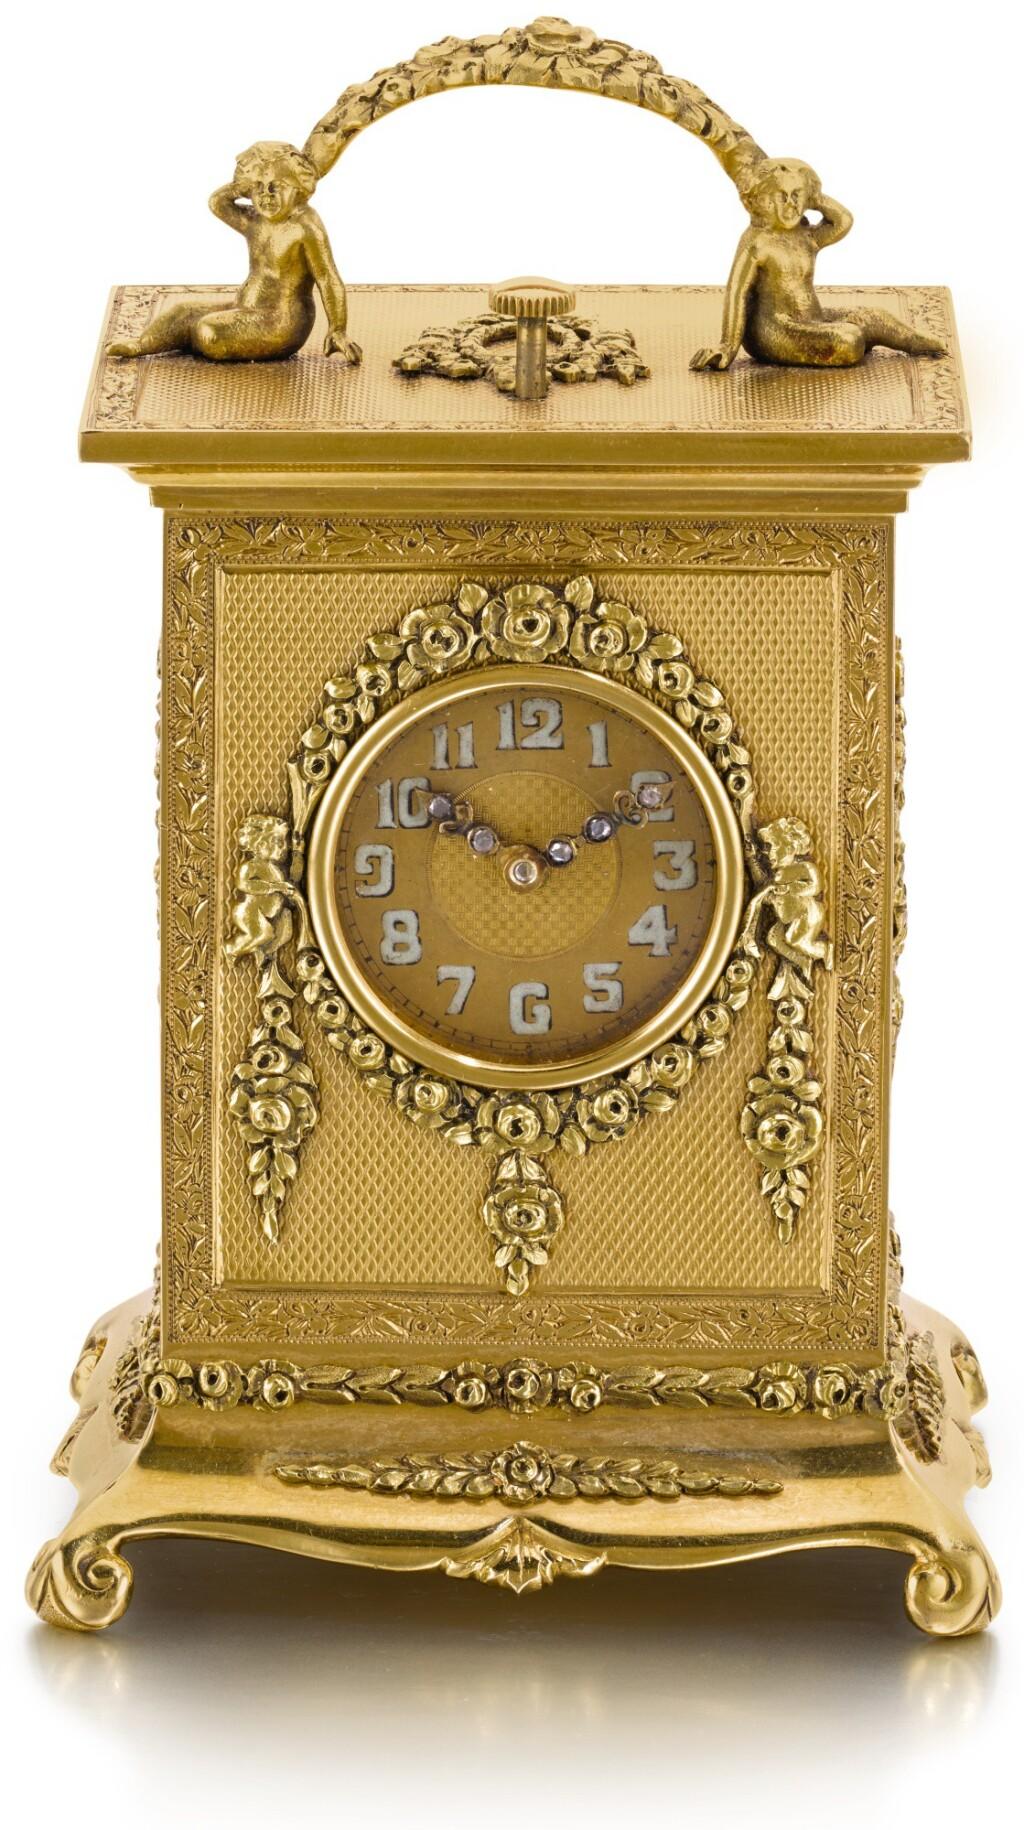 L. TISSOT & CO | A MINIATURE GOLD QUARTER REPEATING CARRIAGE TIMEPIECE  1924